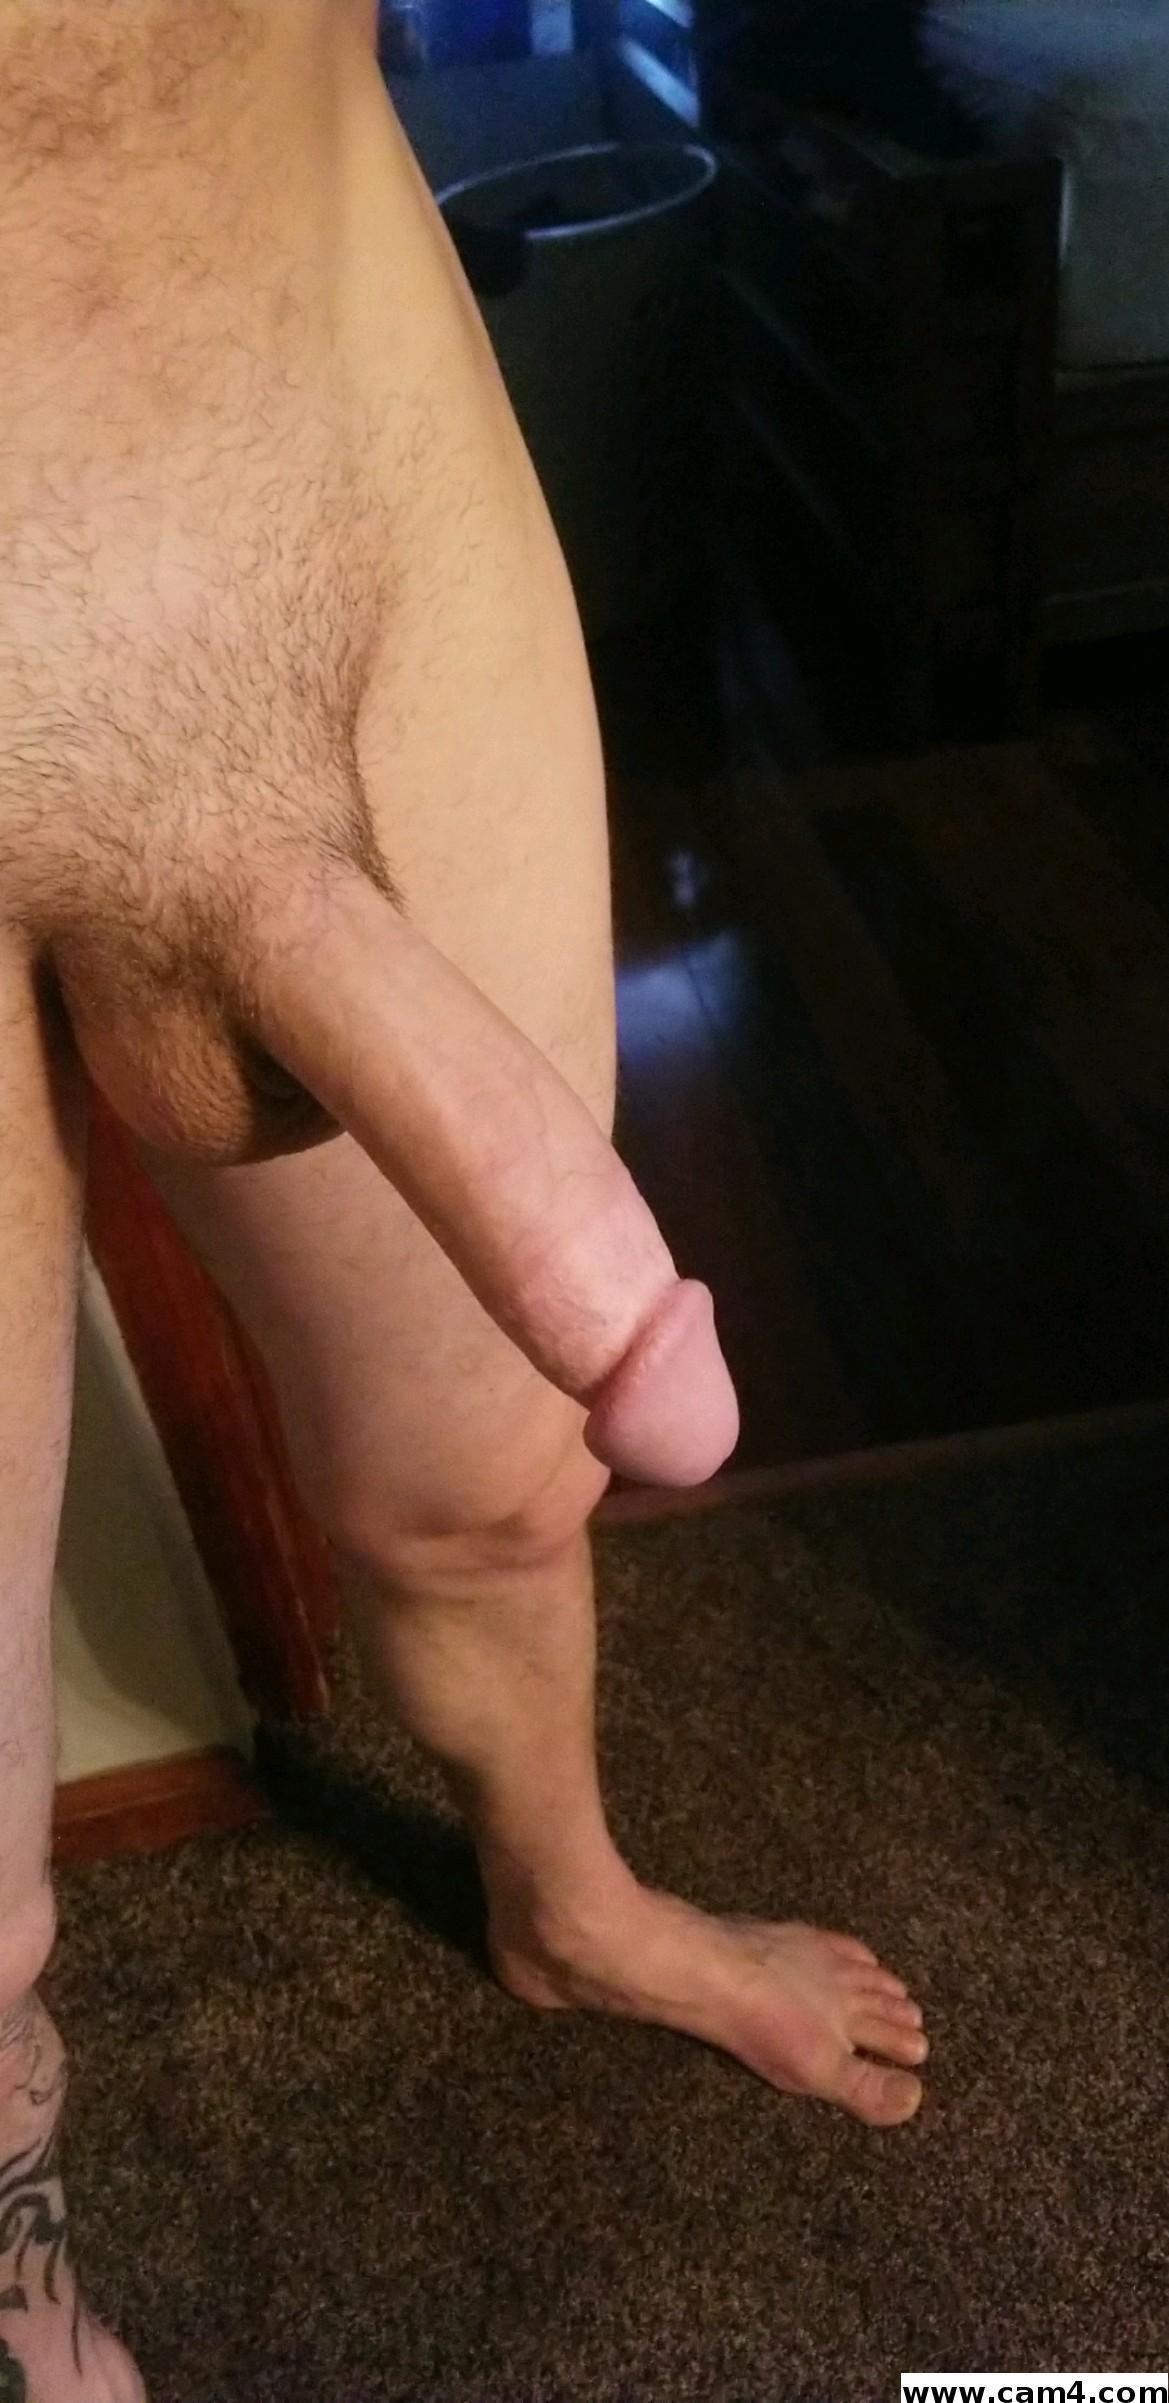 Heavyhung1?s=emrdv7zlhkahiktgbfn0emyudkjmoohgmdy6iqfehci=